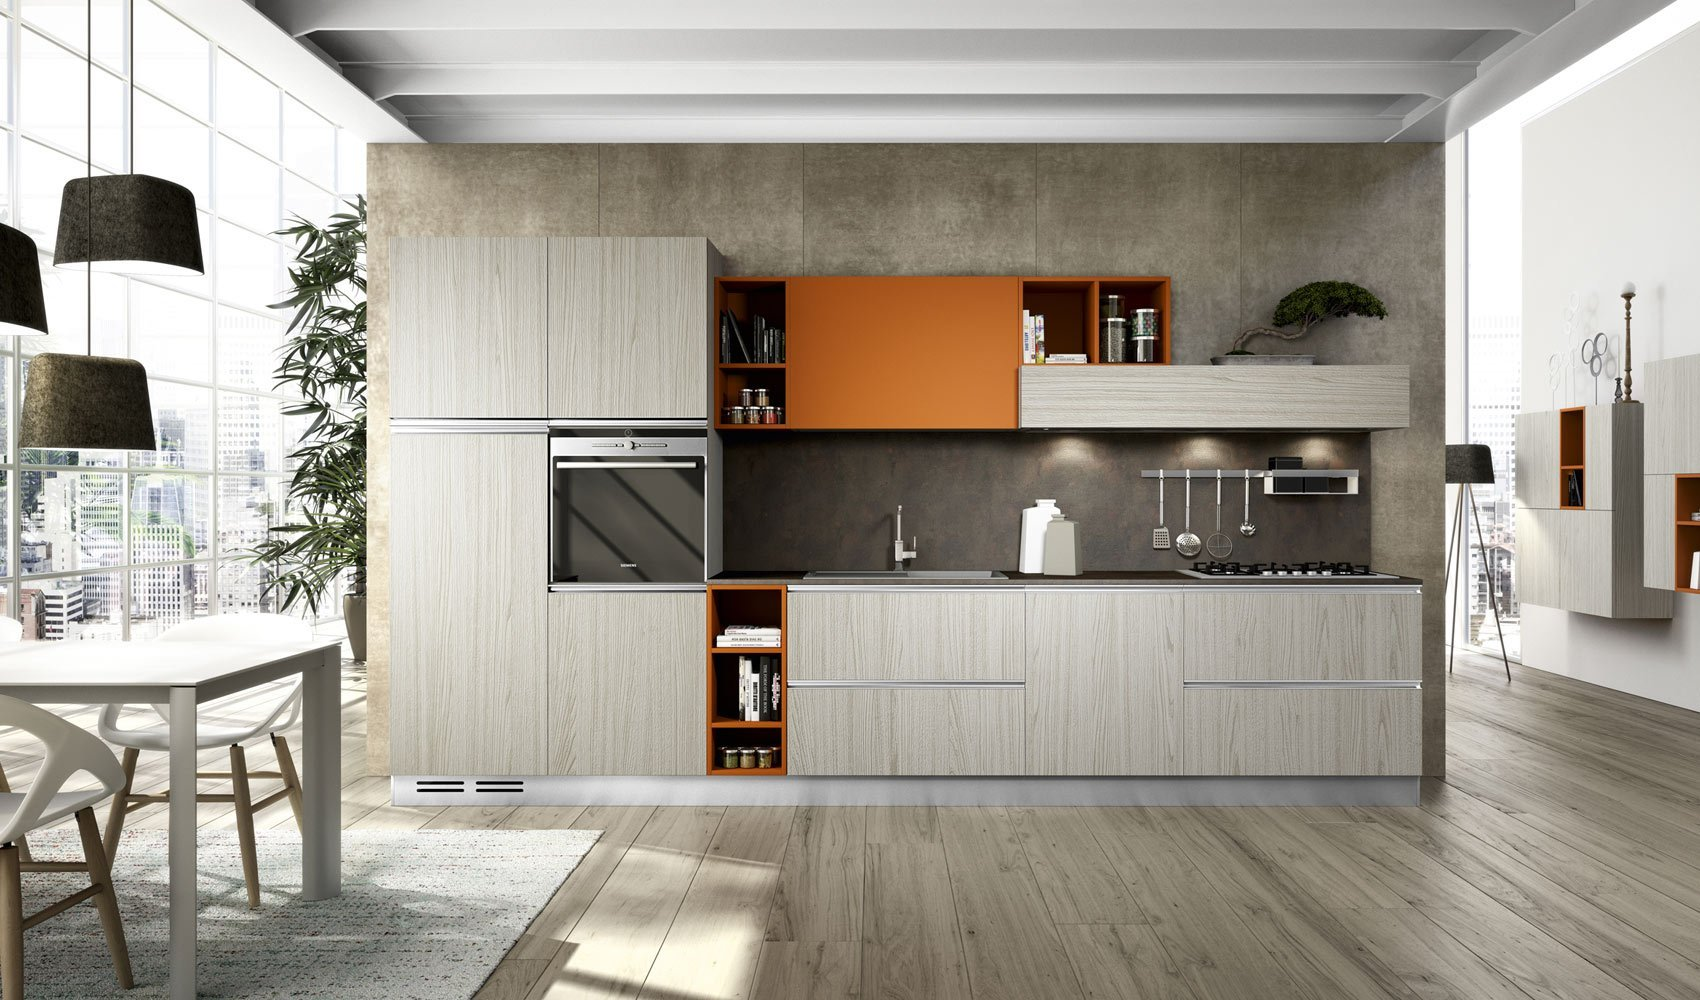 Cucine in poco spazio za06 regardsdefemmes - Riordinare la cucina ...